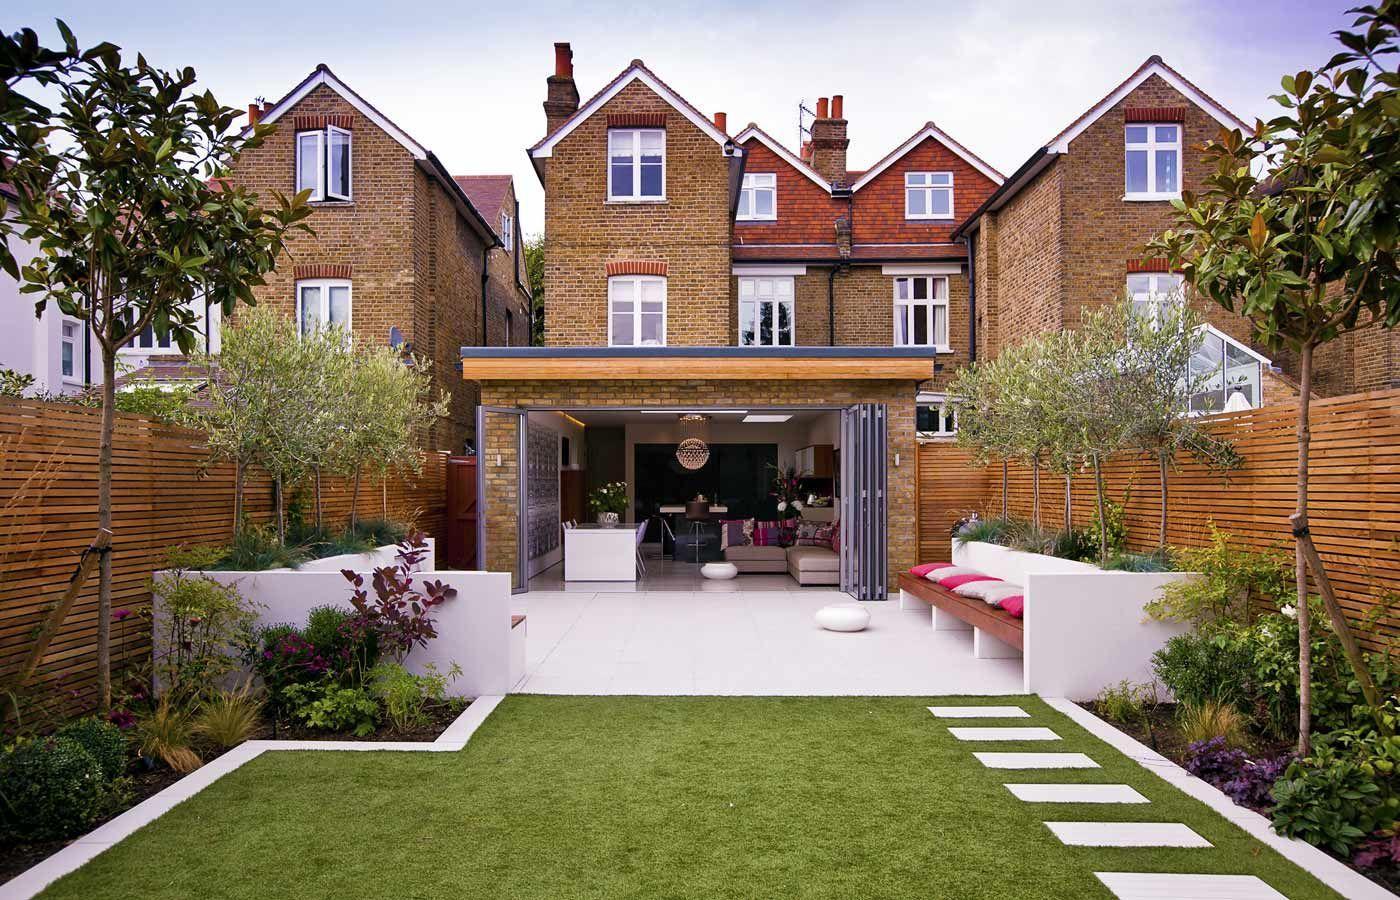 Image result for terraced house back garden ideas | Modern ...